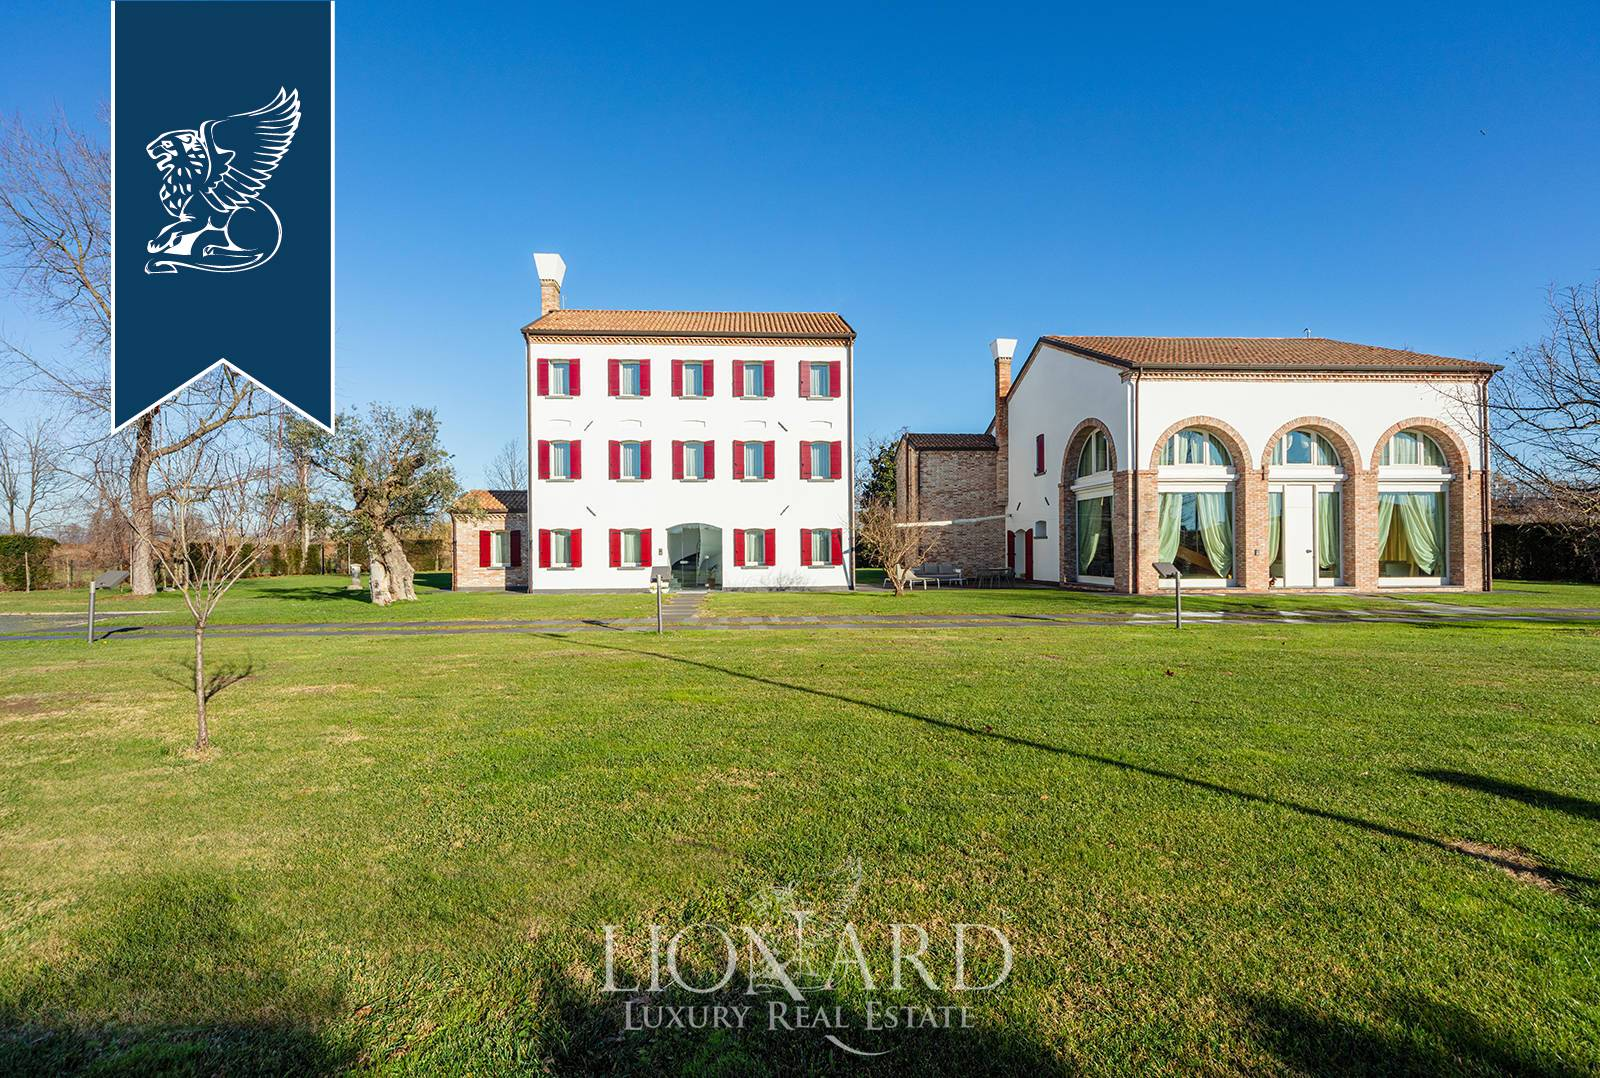 Rustico in Vendita a San Dona' Di Piave: 0 locali, 1000 mq - Foto 2